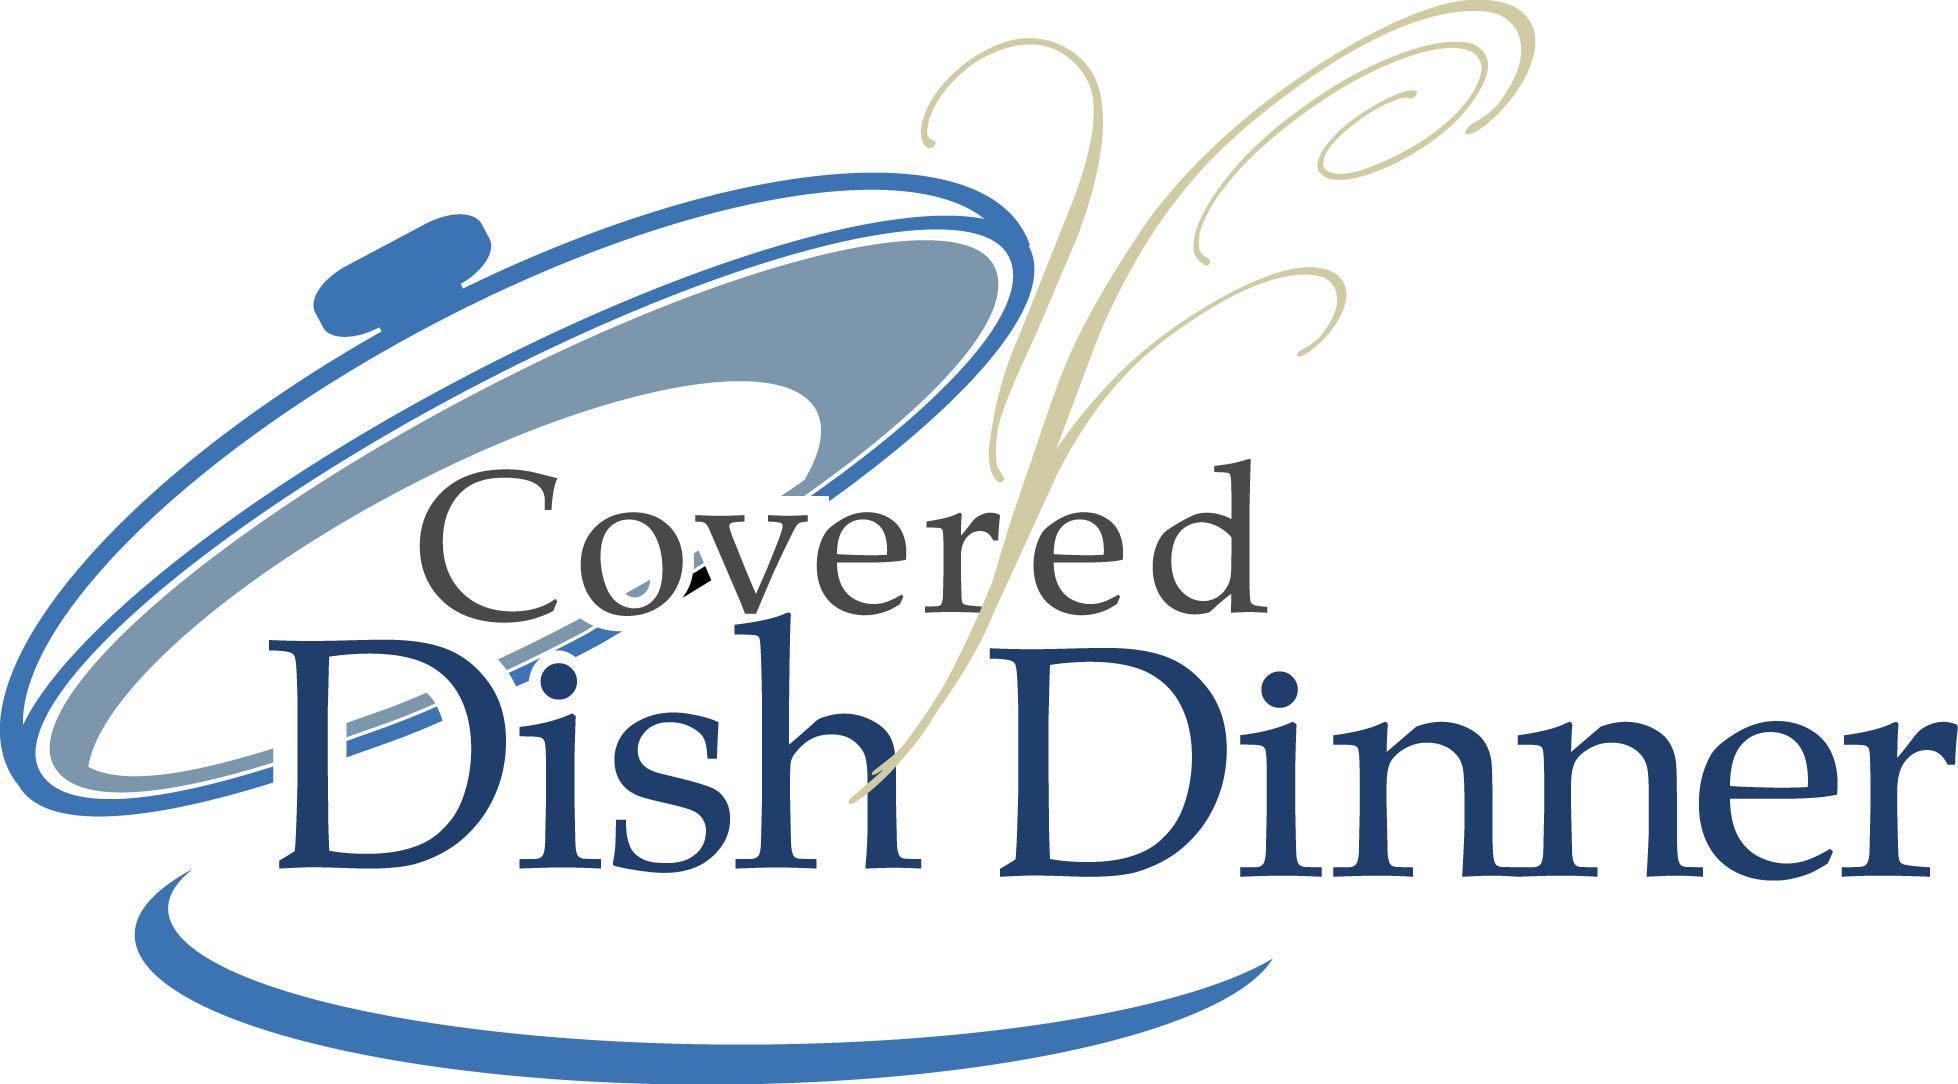 1958x1084 Church Fellowship Dinner Clipart